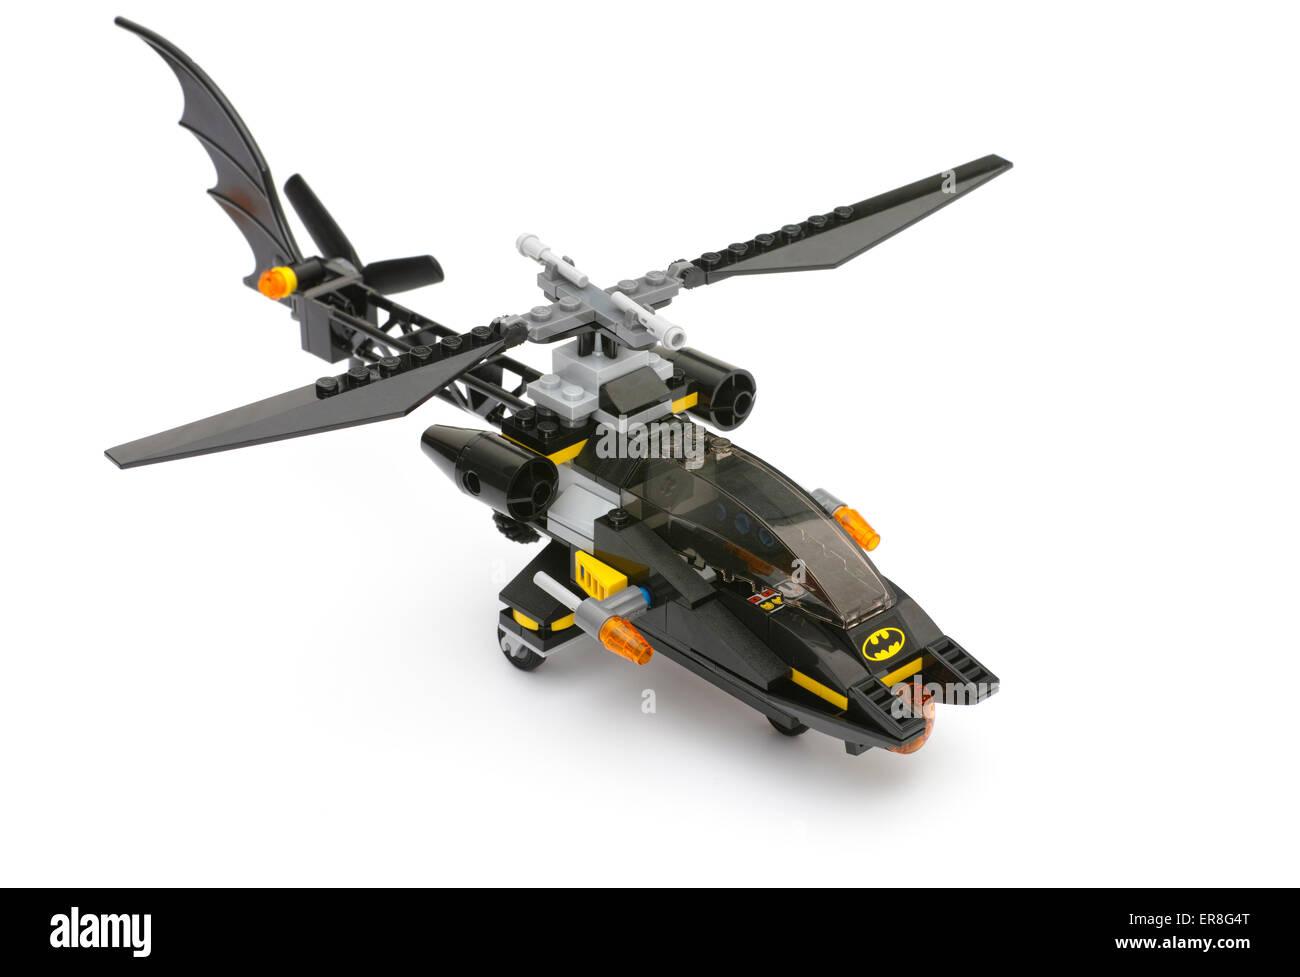 Tambov, Russian Federation - May 27, 2015 Lego Batcopter on white background. Studio shot. - Stock Image